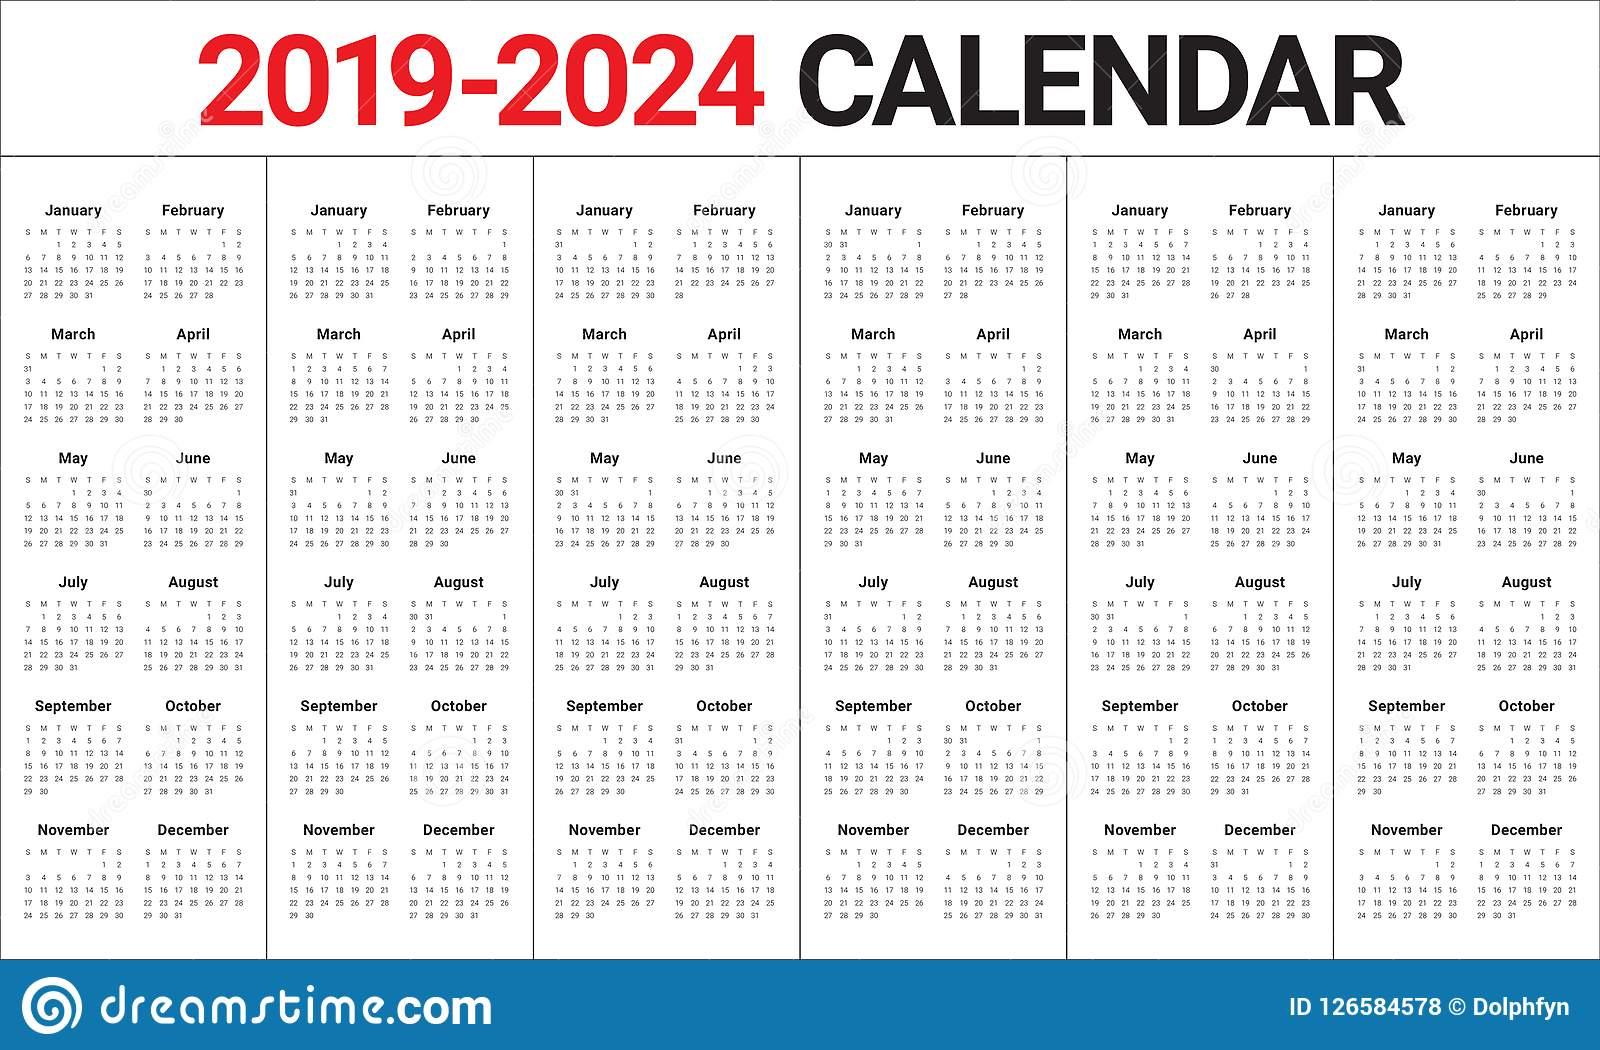 Ramadan Calendar 2020. 💣 Islamic Calendar 2020. 20191121 throughout Isha Lunar Calendar 2020